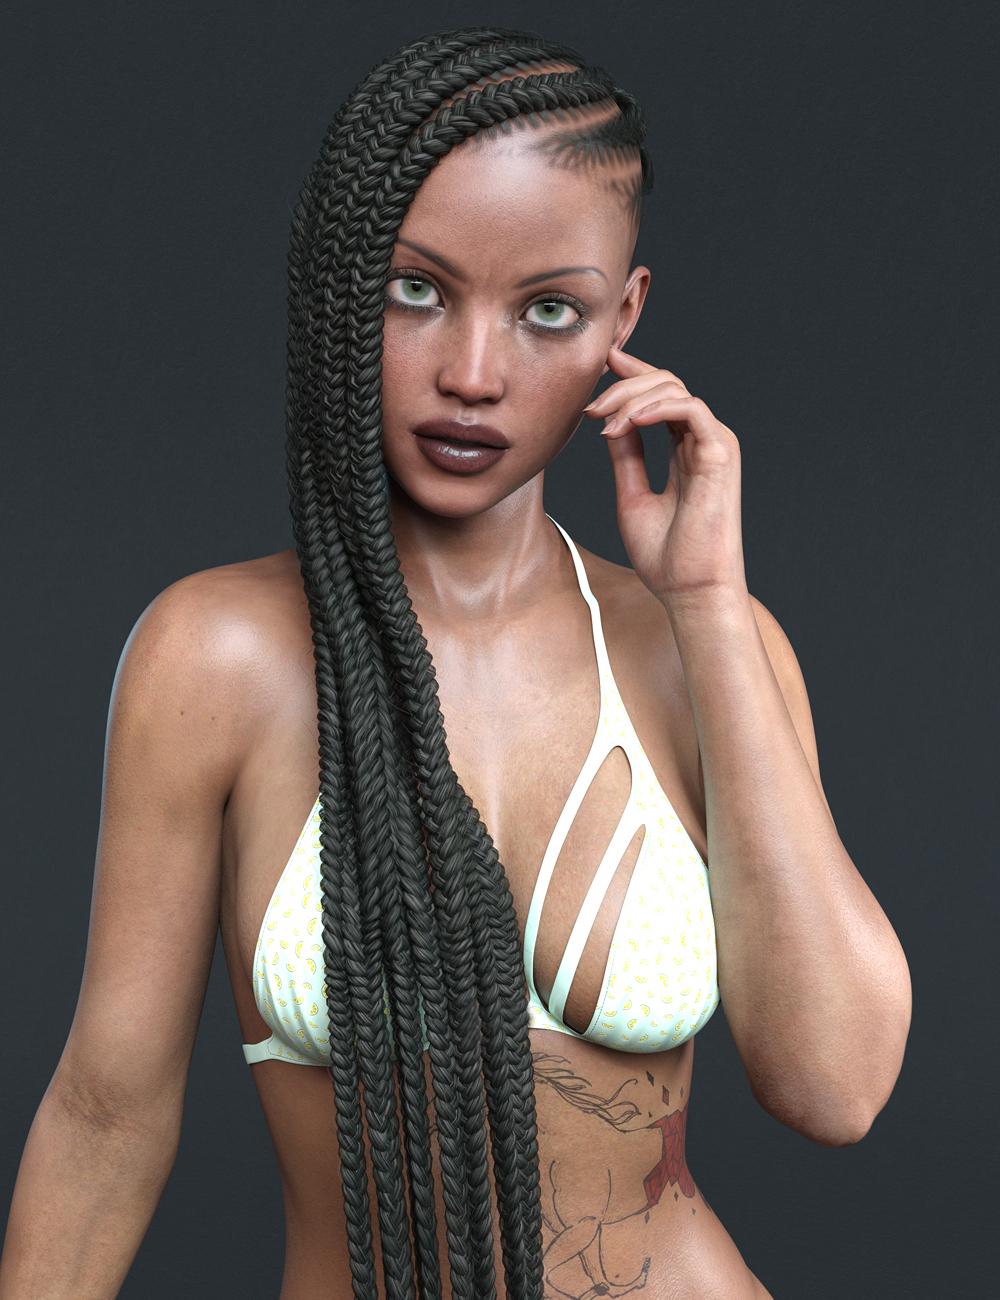 MR Jasmine for Genesis 8.1 Female by: Marcius, 3D Models by Daz 3D